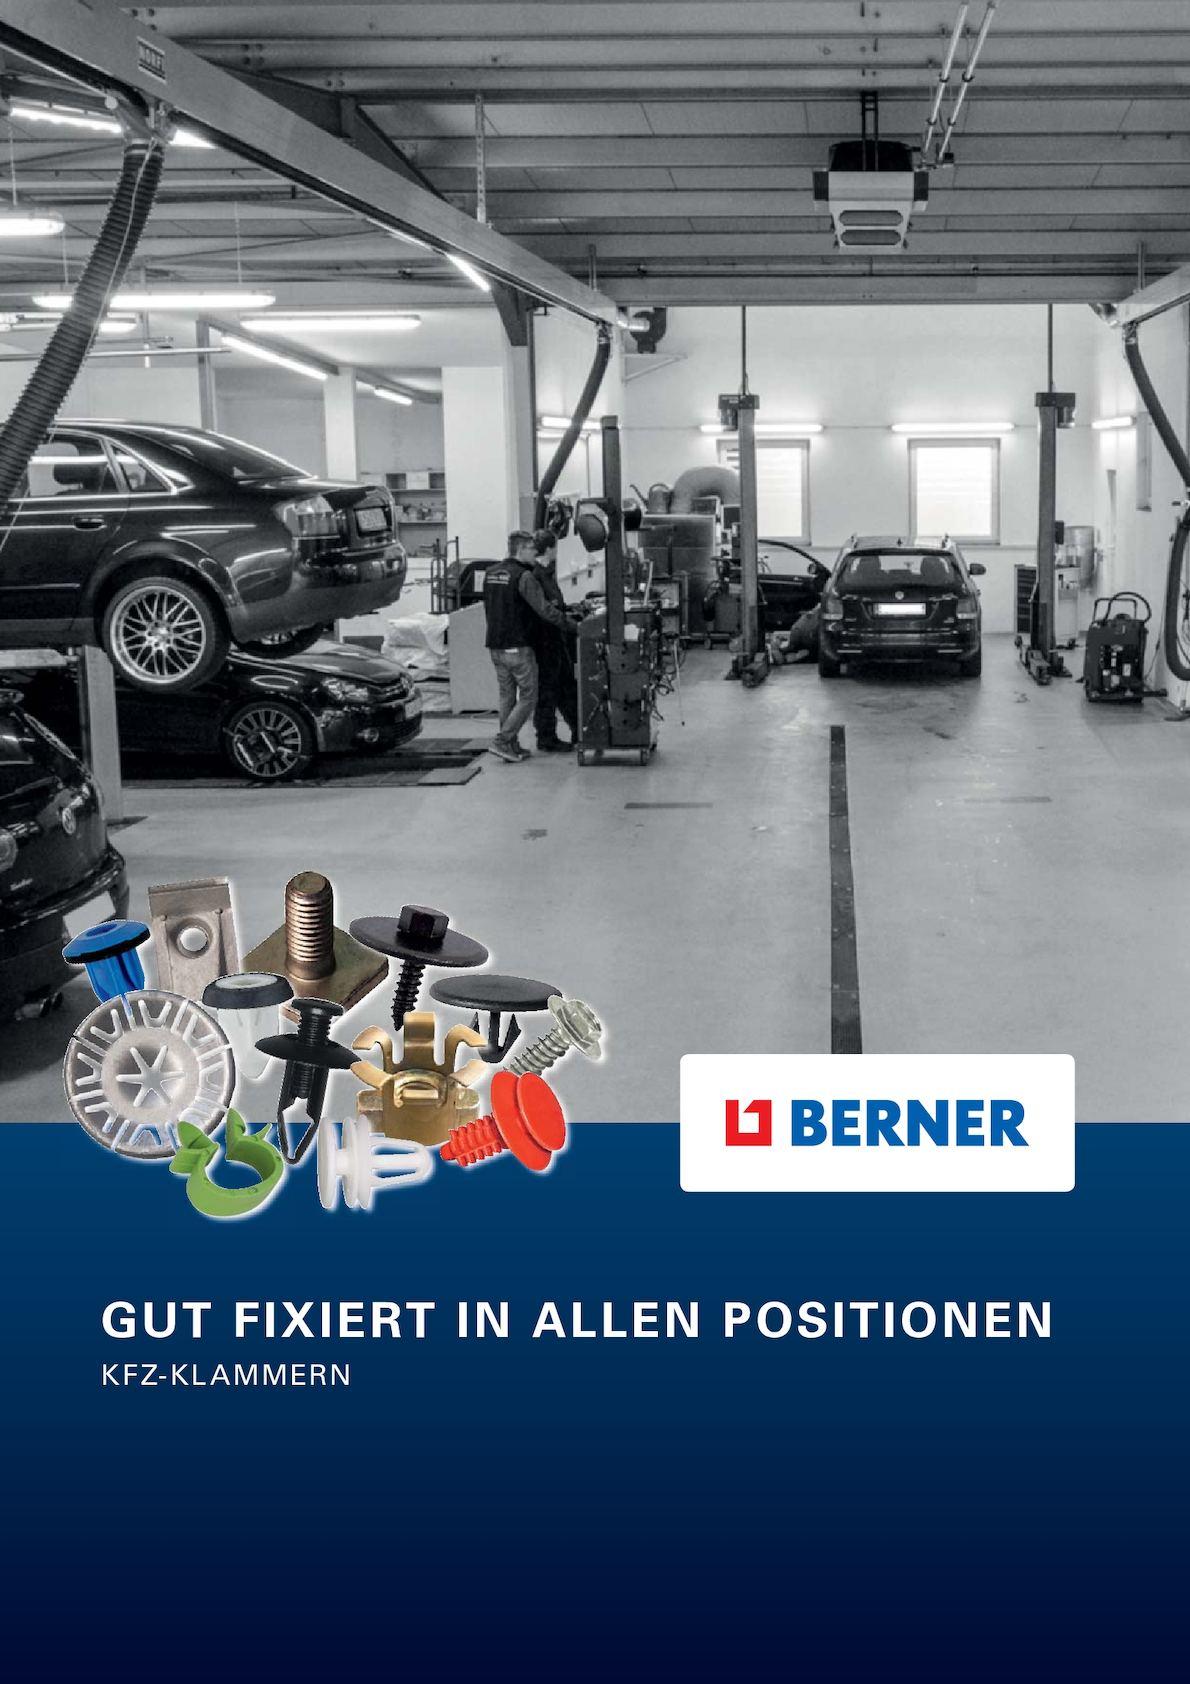 5x Schutz Befestigung Clip VW Peugeot Fiat Citroen 155809966 6992G2 14115980